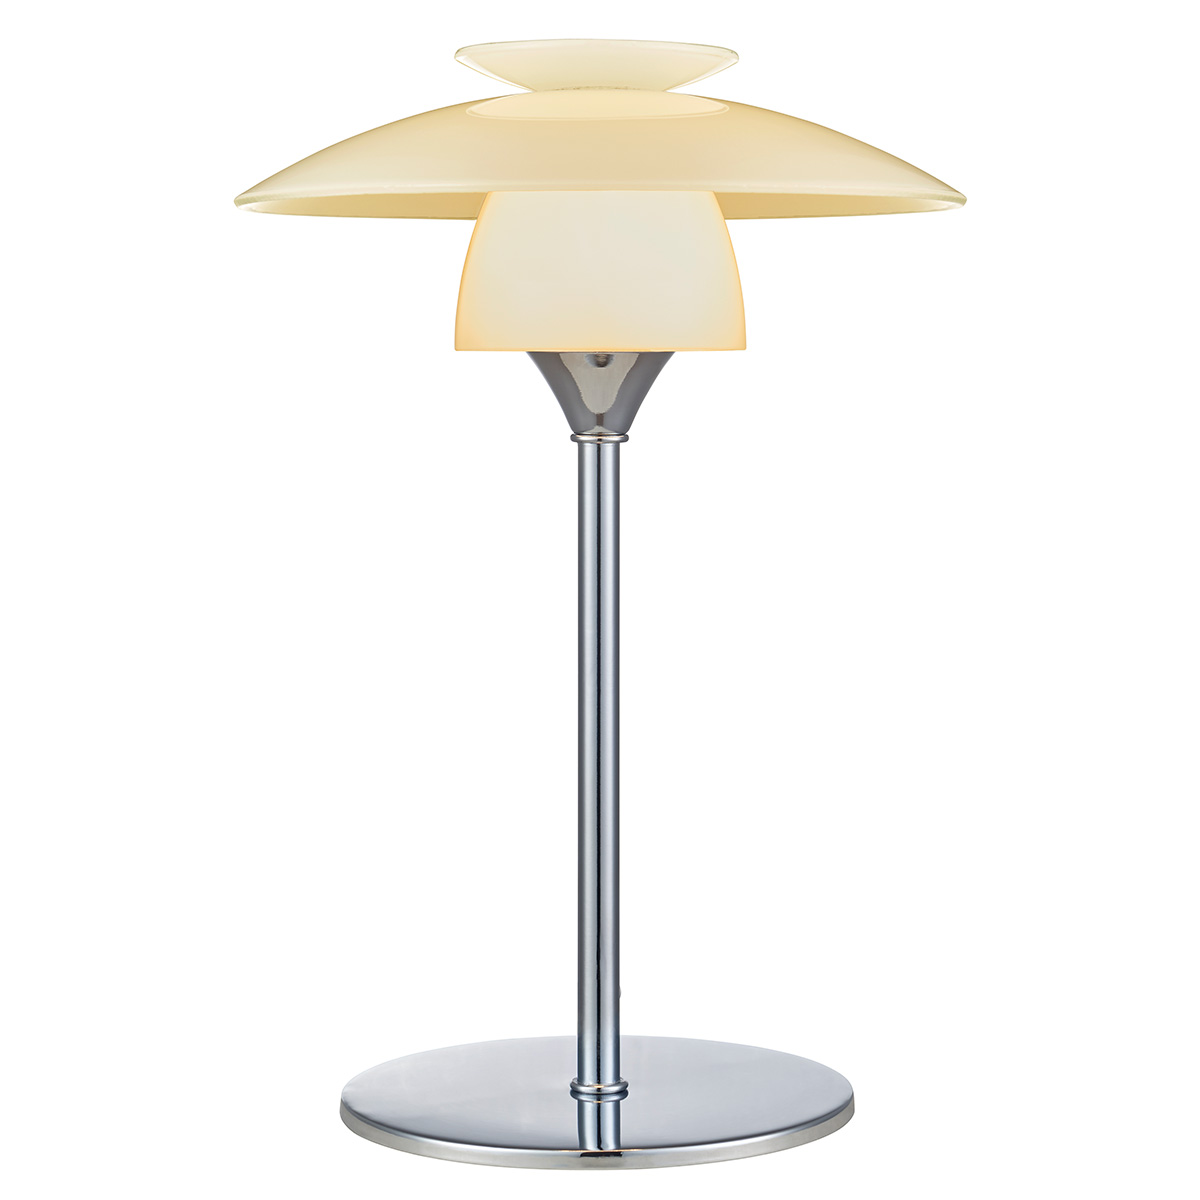 Image of   Halo Design bordlampe - Scandinavia - Glas